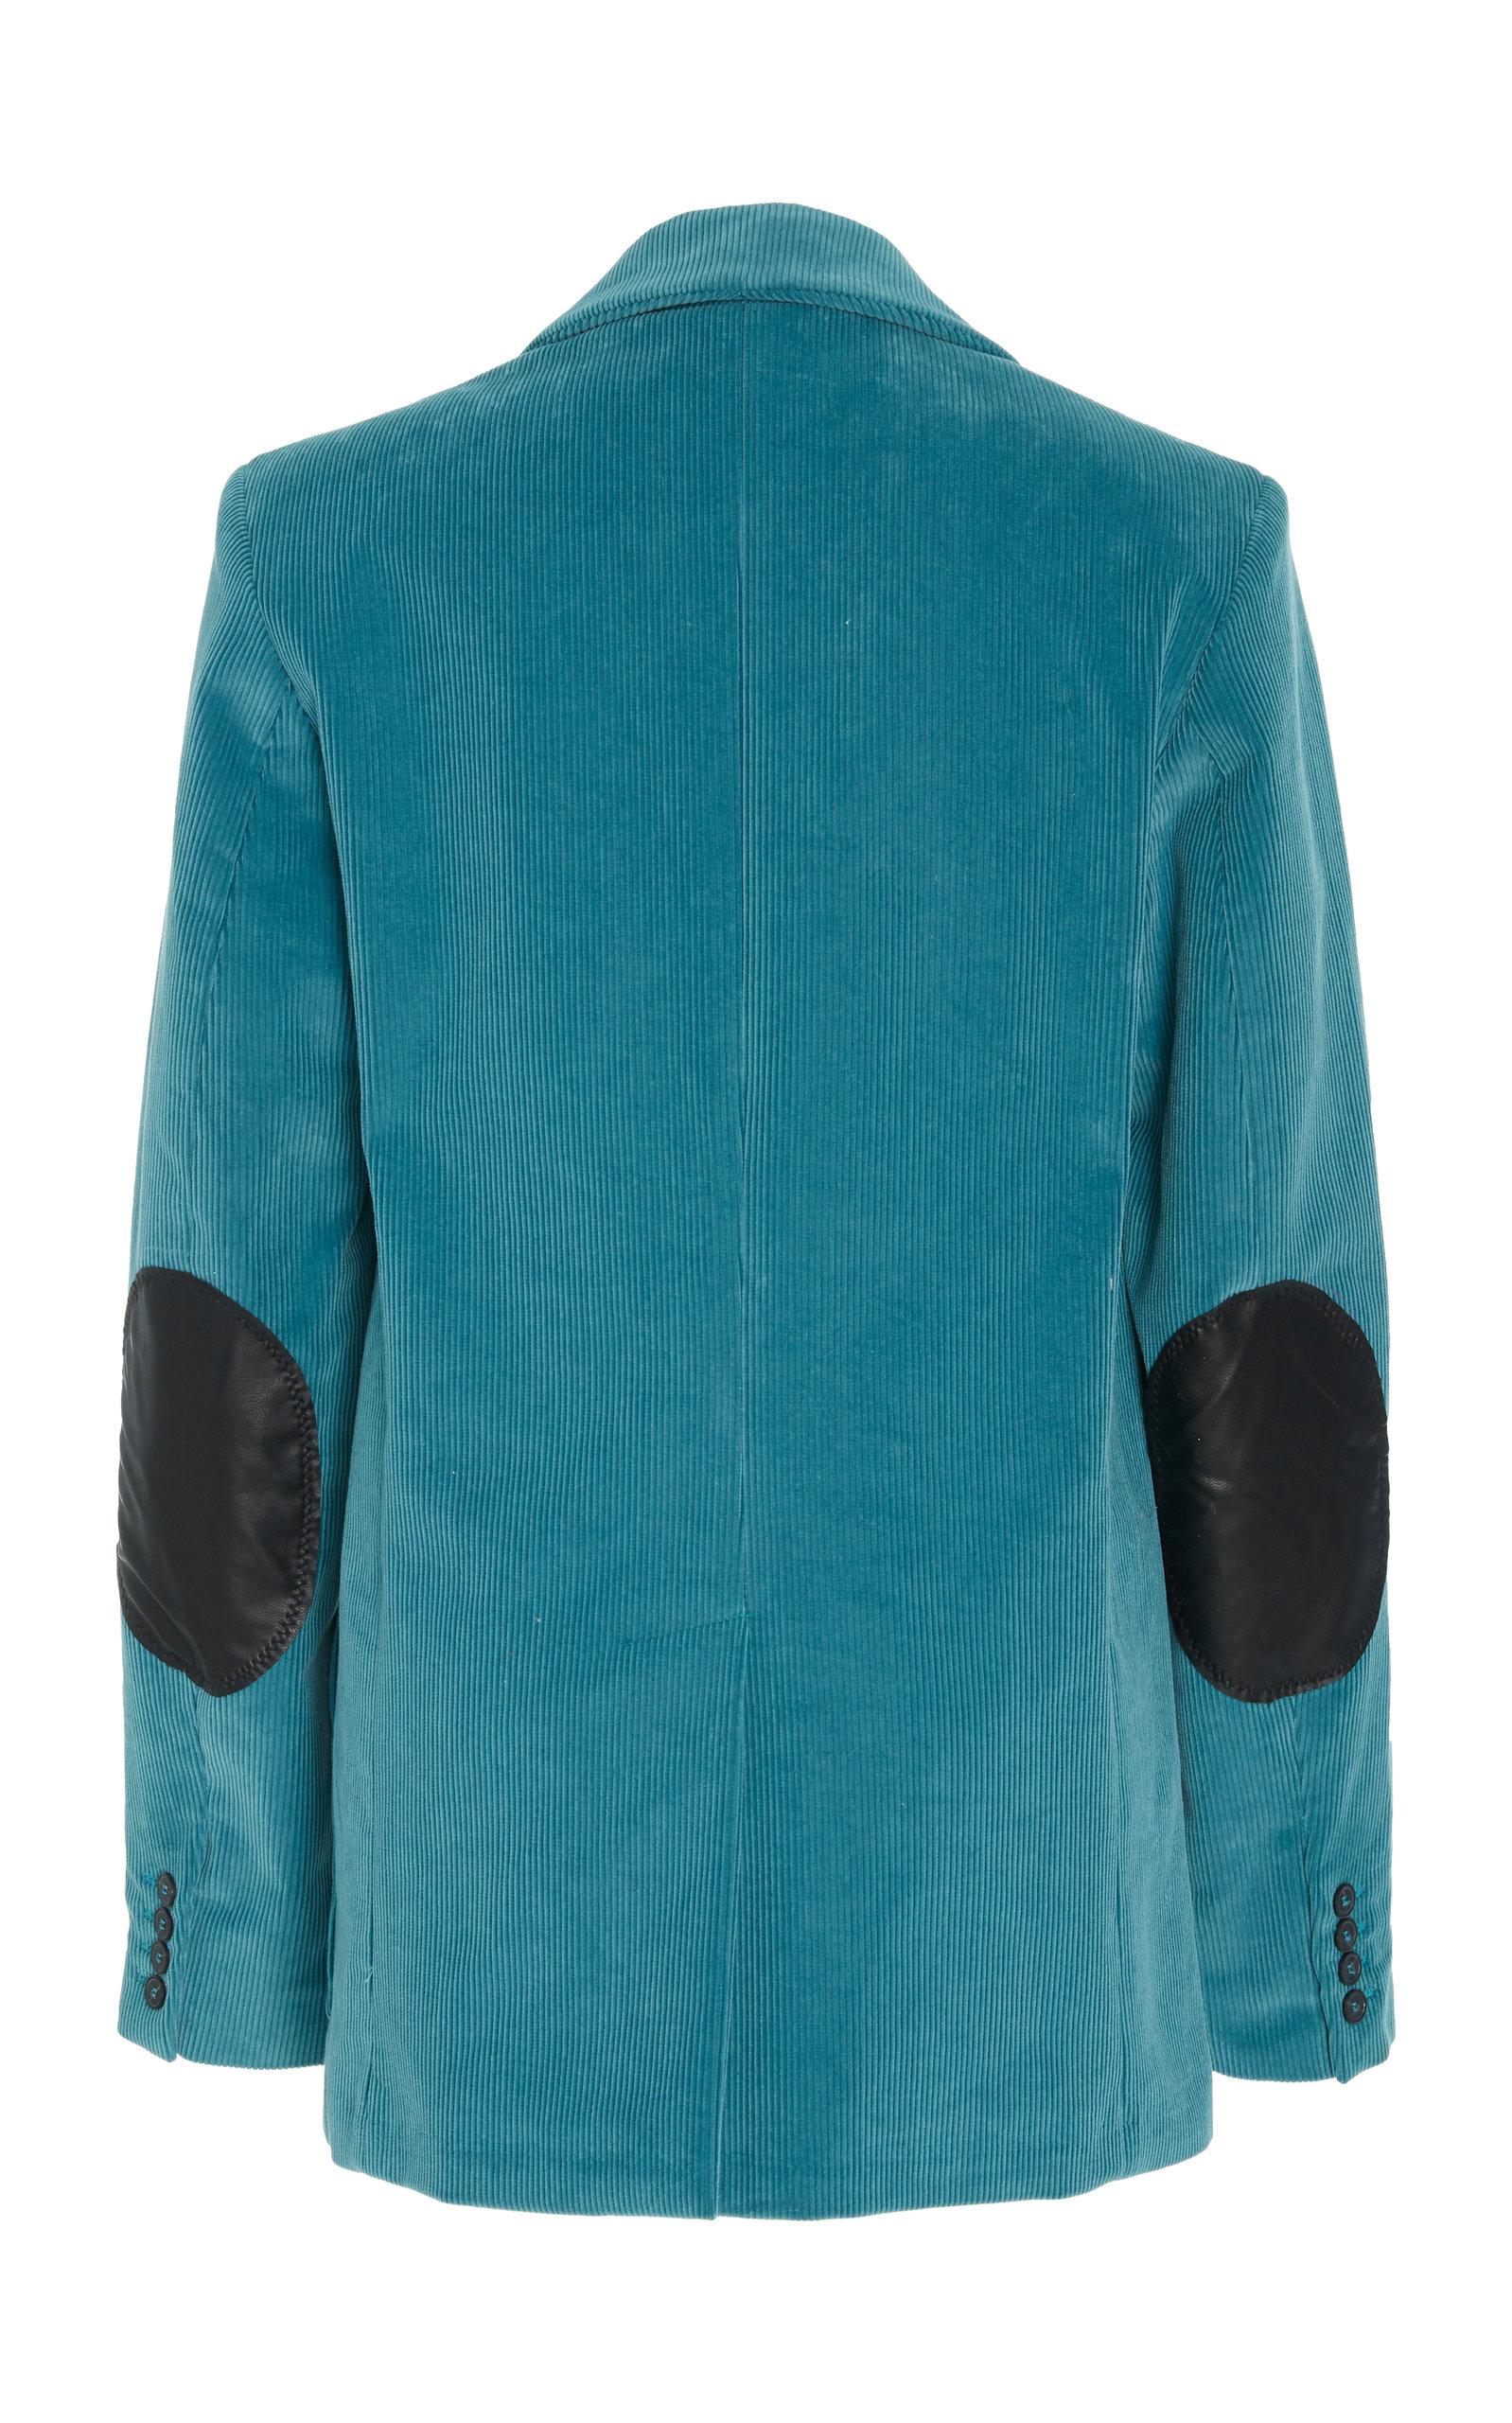 Moda RIKA BY Jacket ULRIKA Operandi LUNDGREN by Adam q8Ywf8